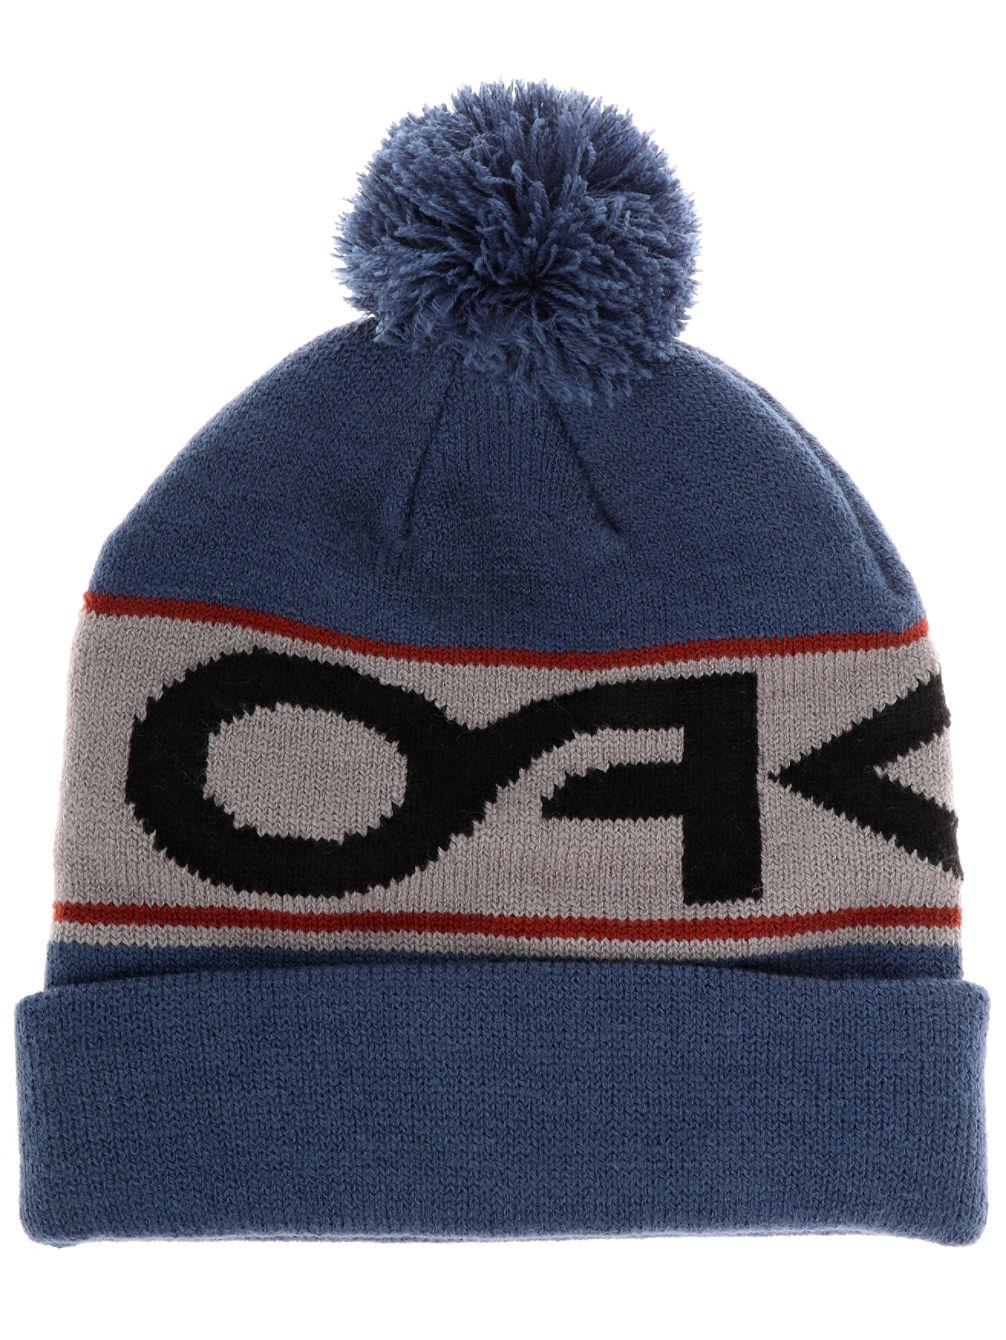 oakley-factory-cuff-beanie